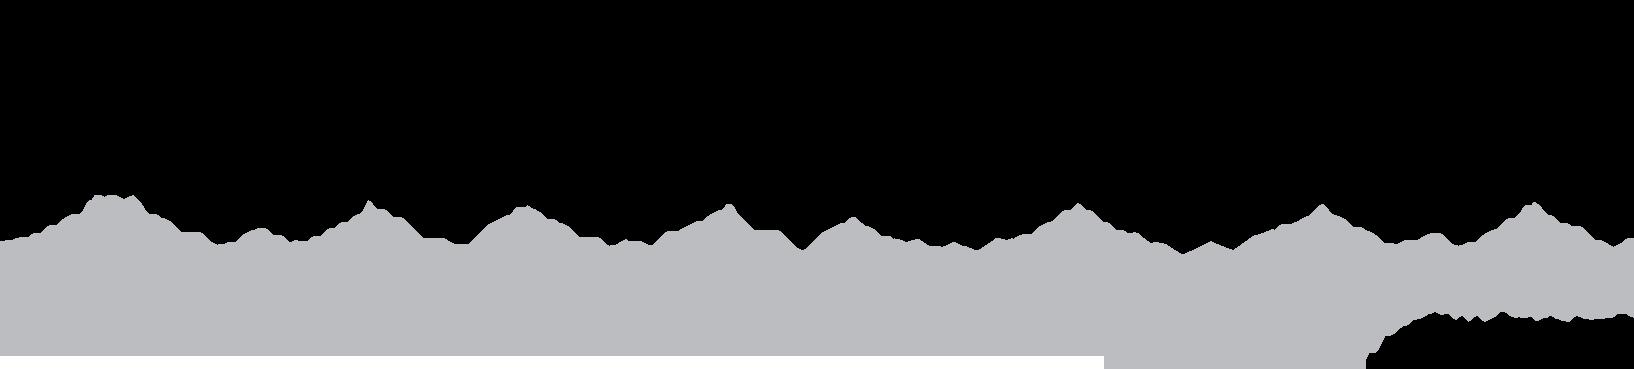 finnagora_rgb-text_0.png